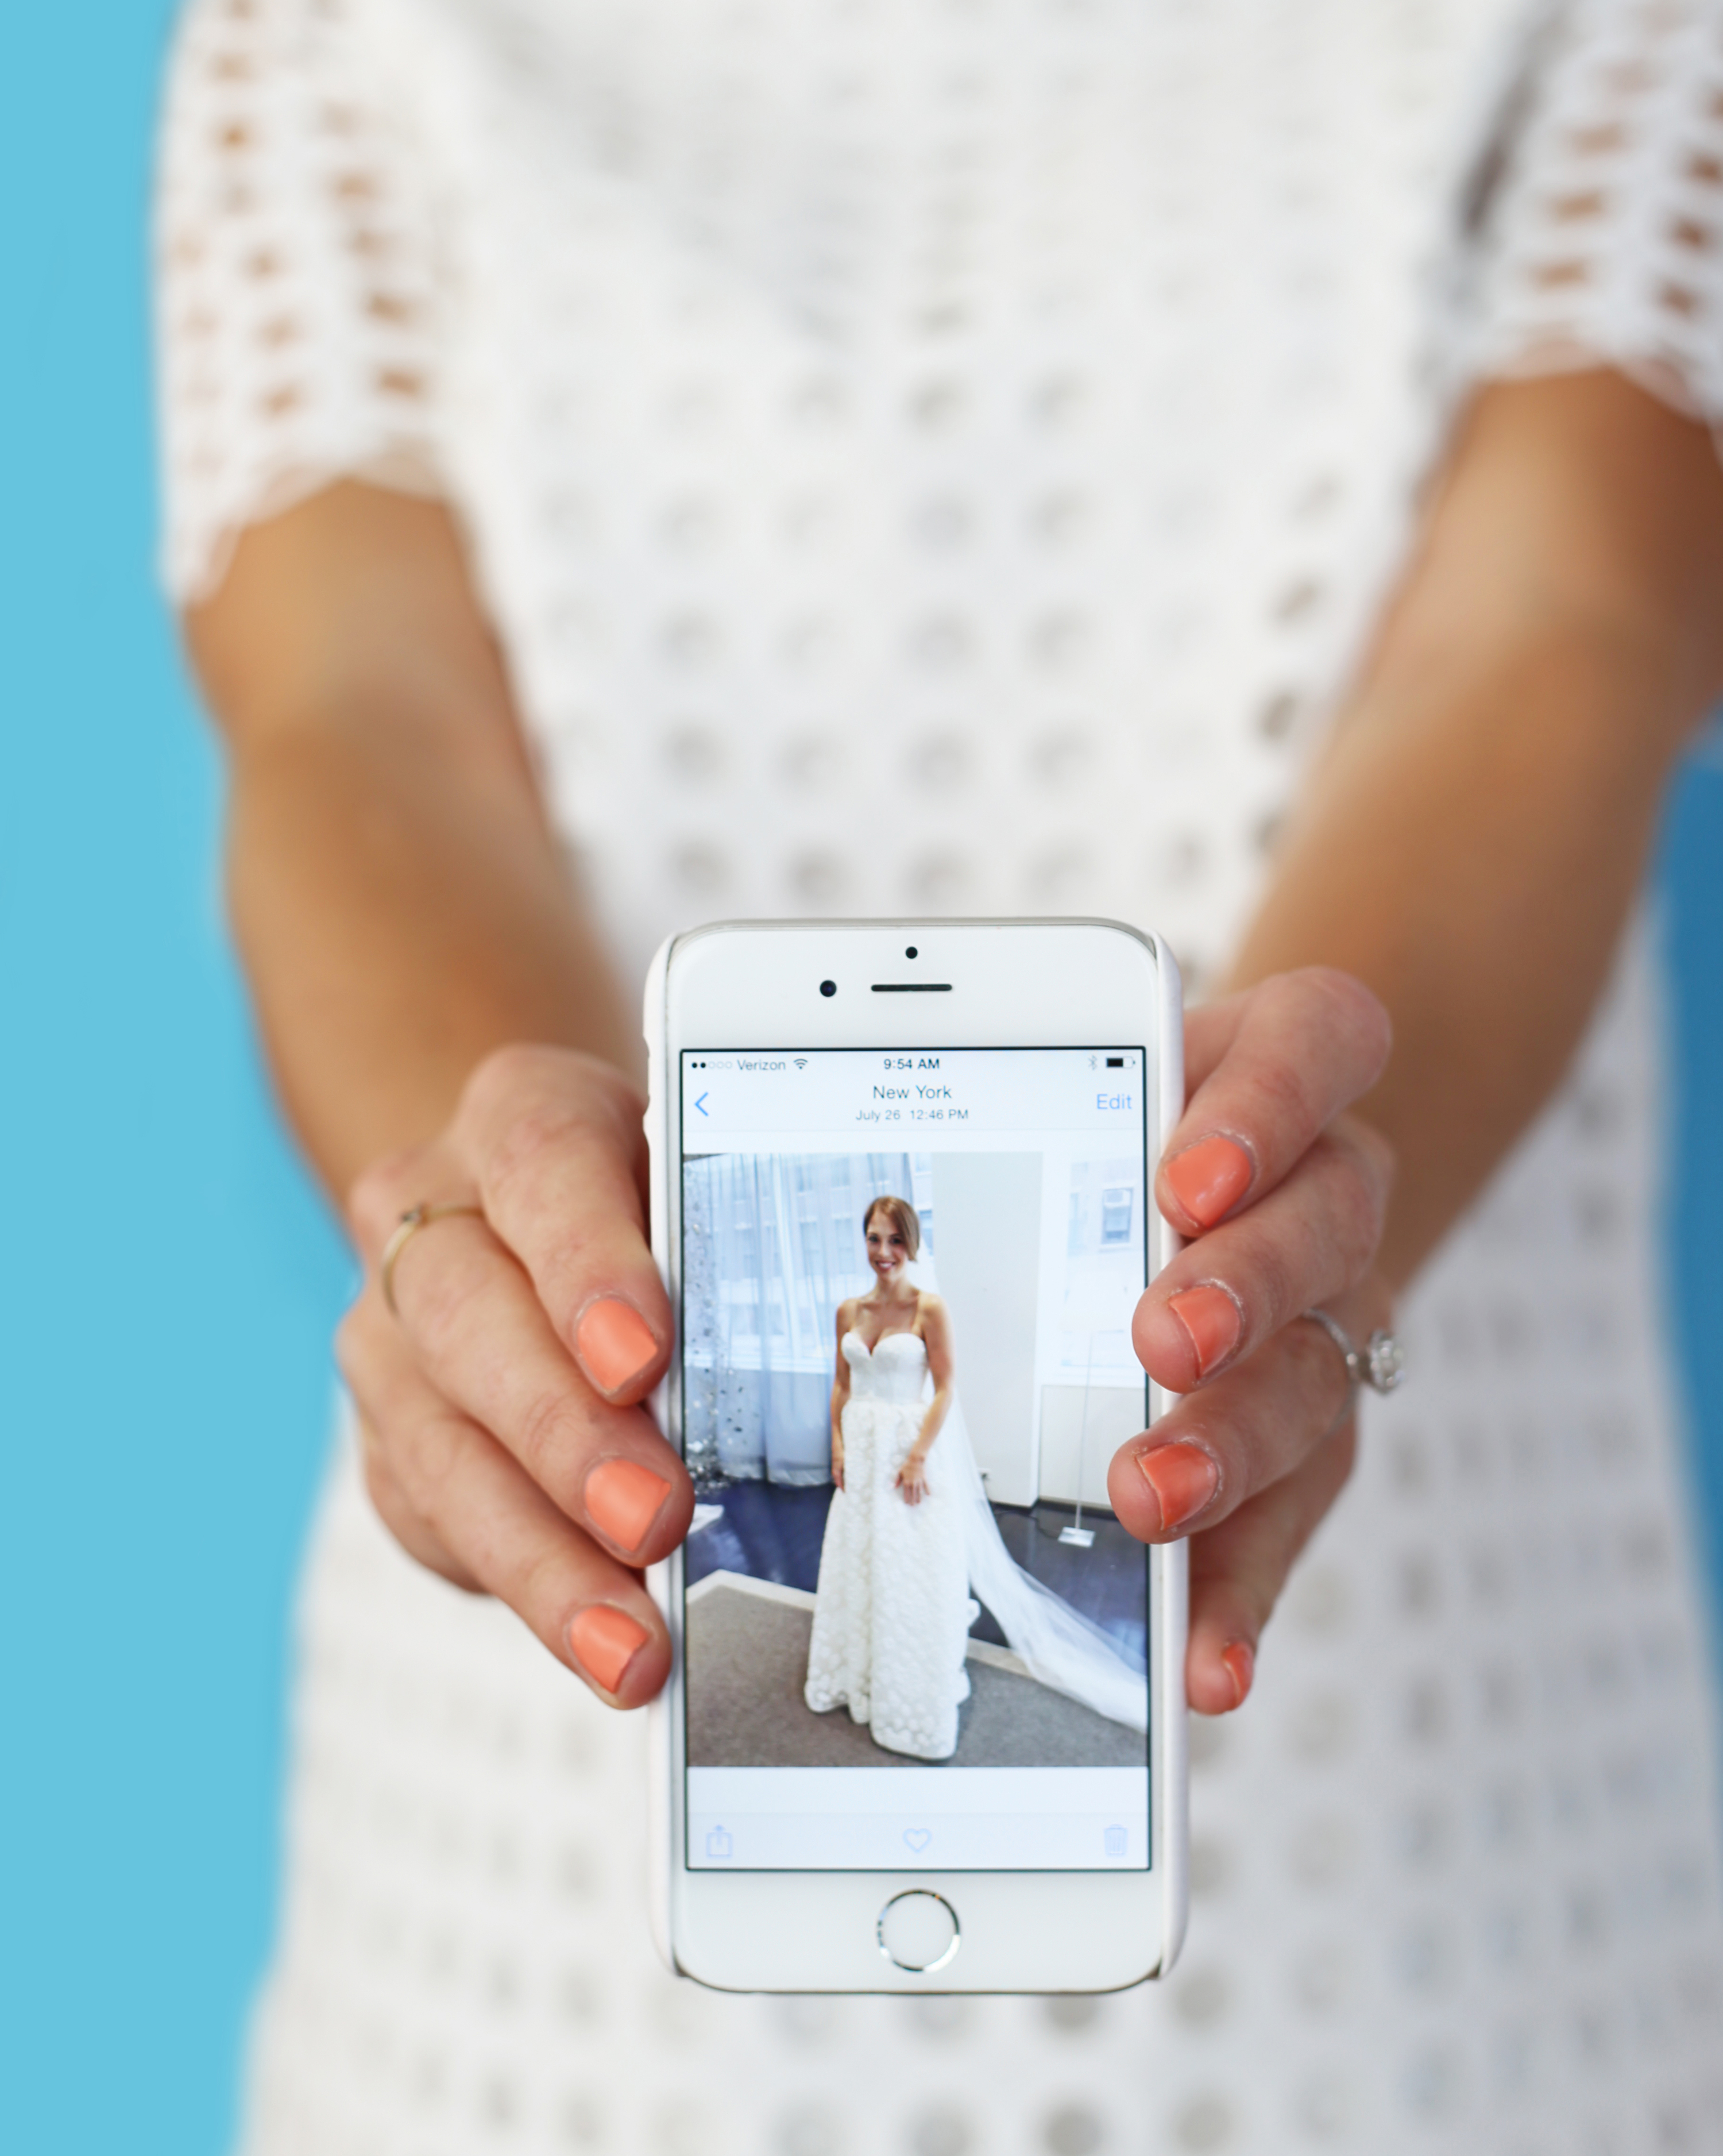 dress-shopping-tips-iphone-photo-in-wedding-dress-0815.jpg